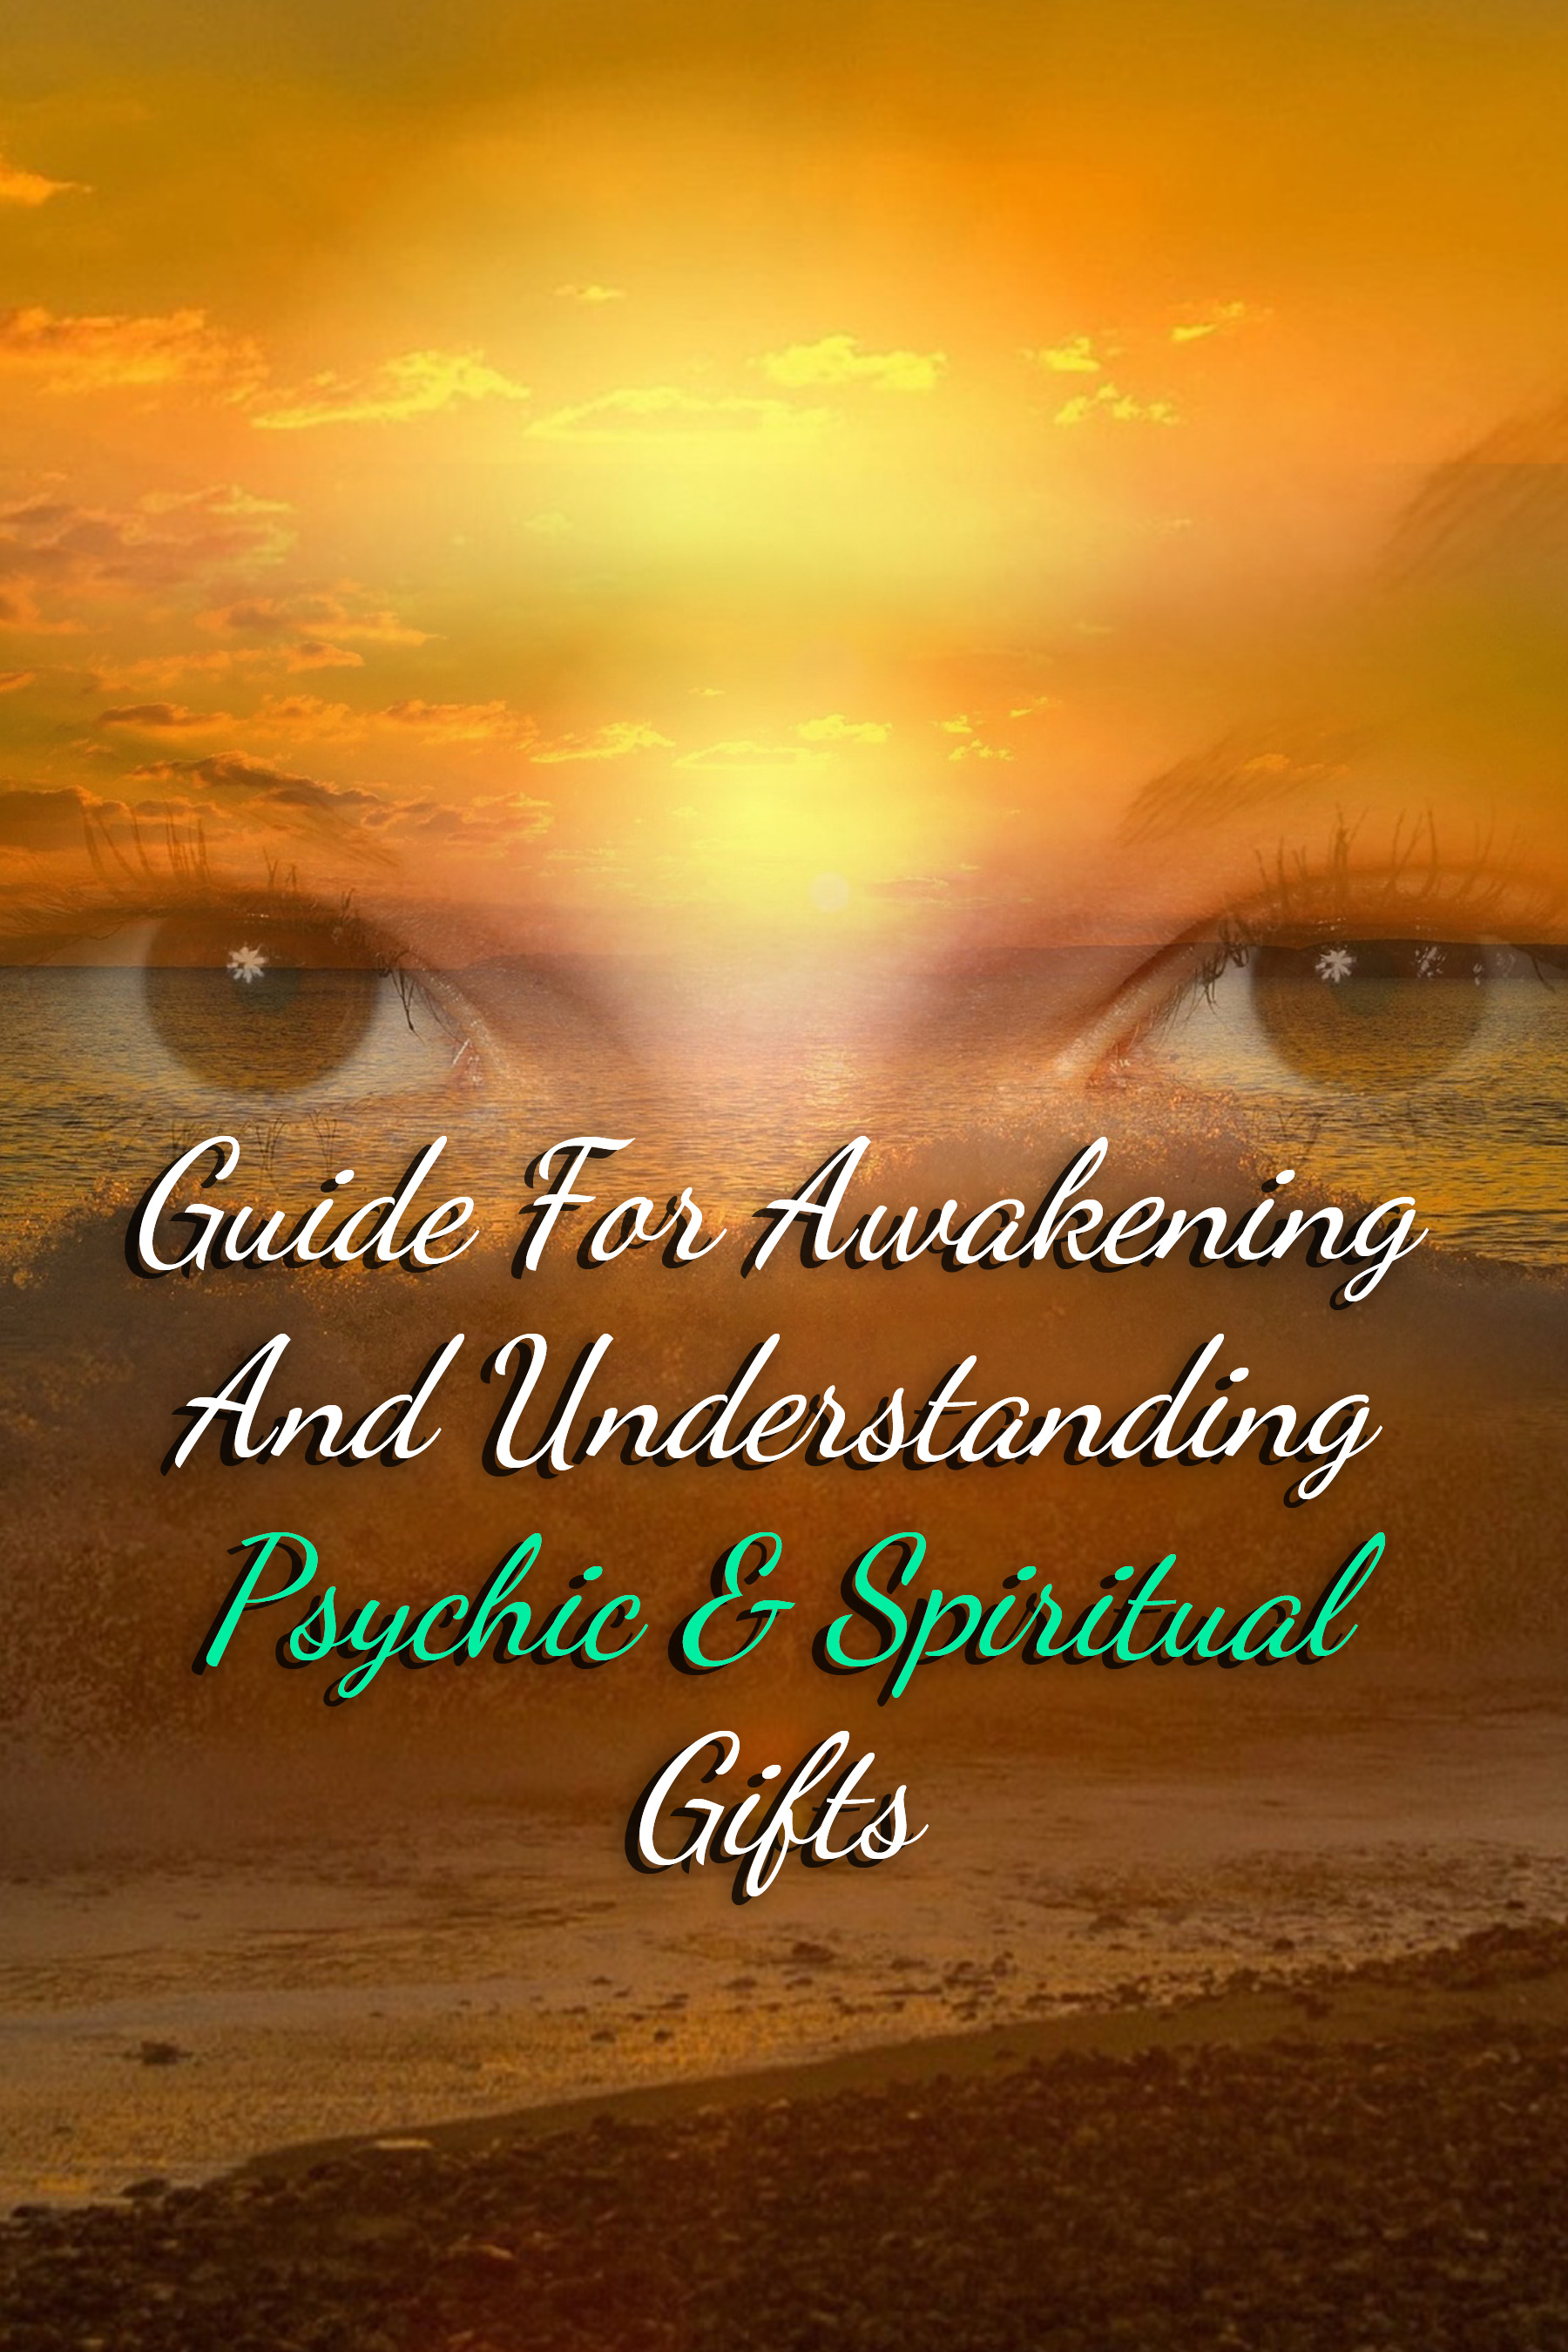 Guide for awakening and understanding psychic spiritual gifts guide for awakening and understanding psychic spiritual gifts negle Gallery